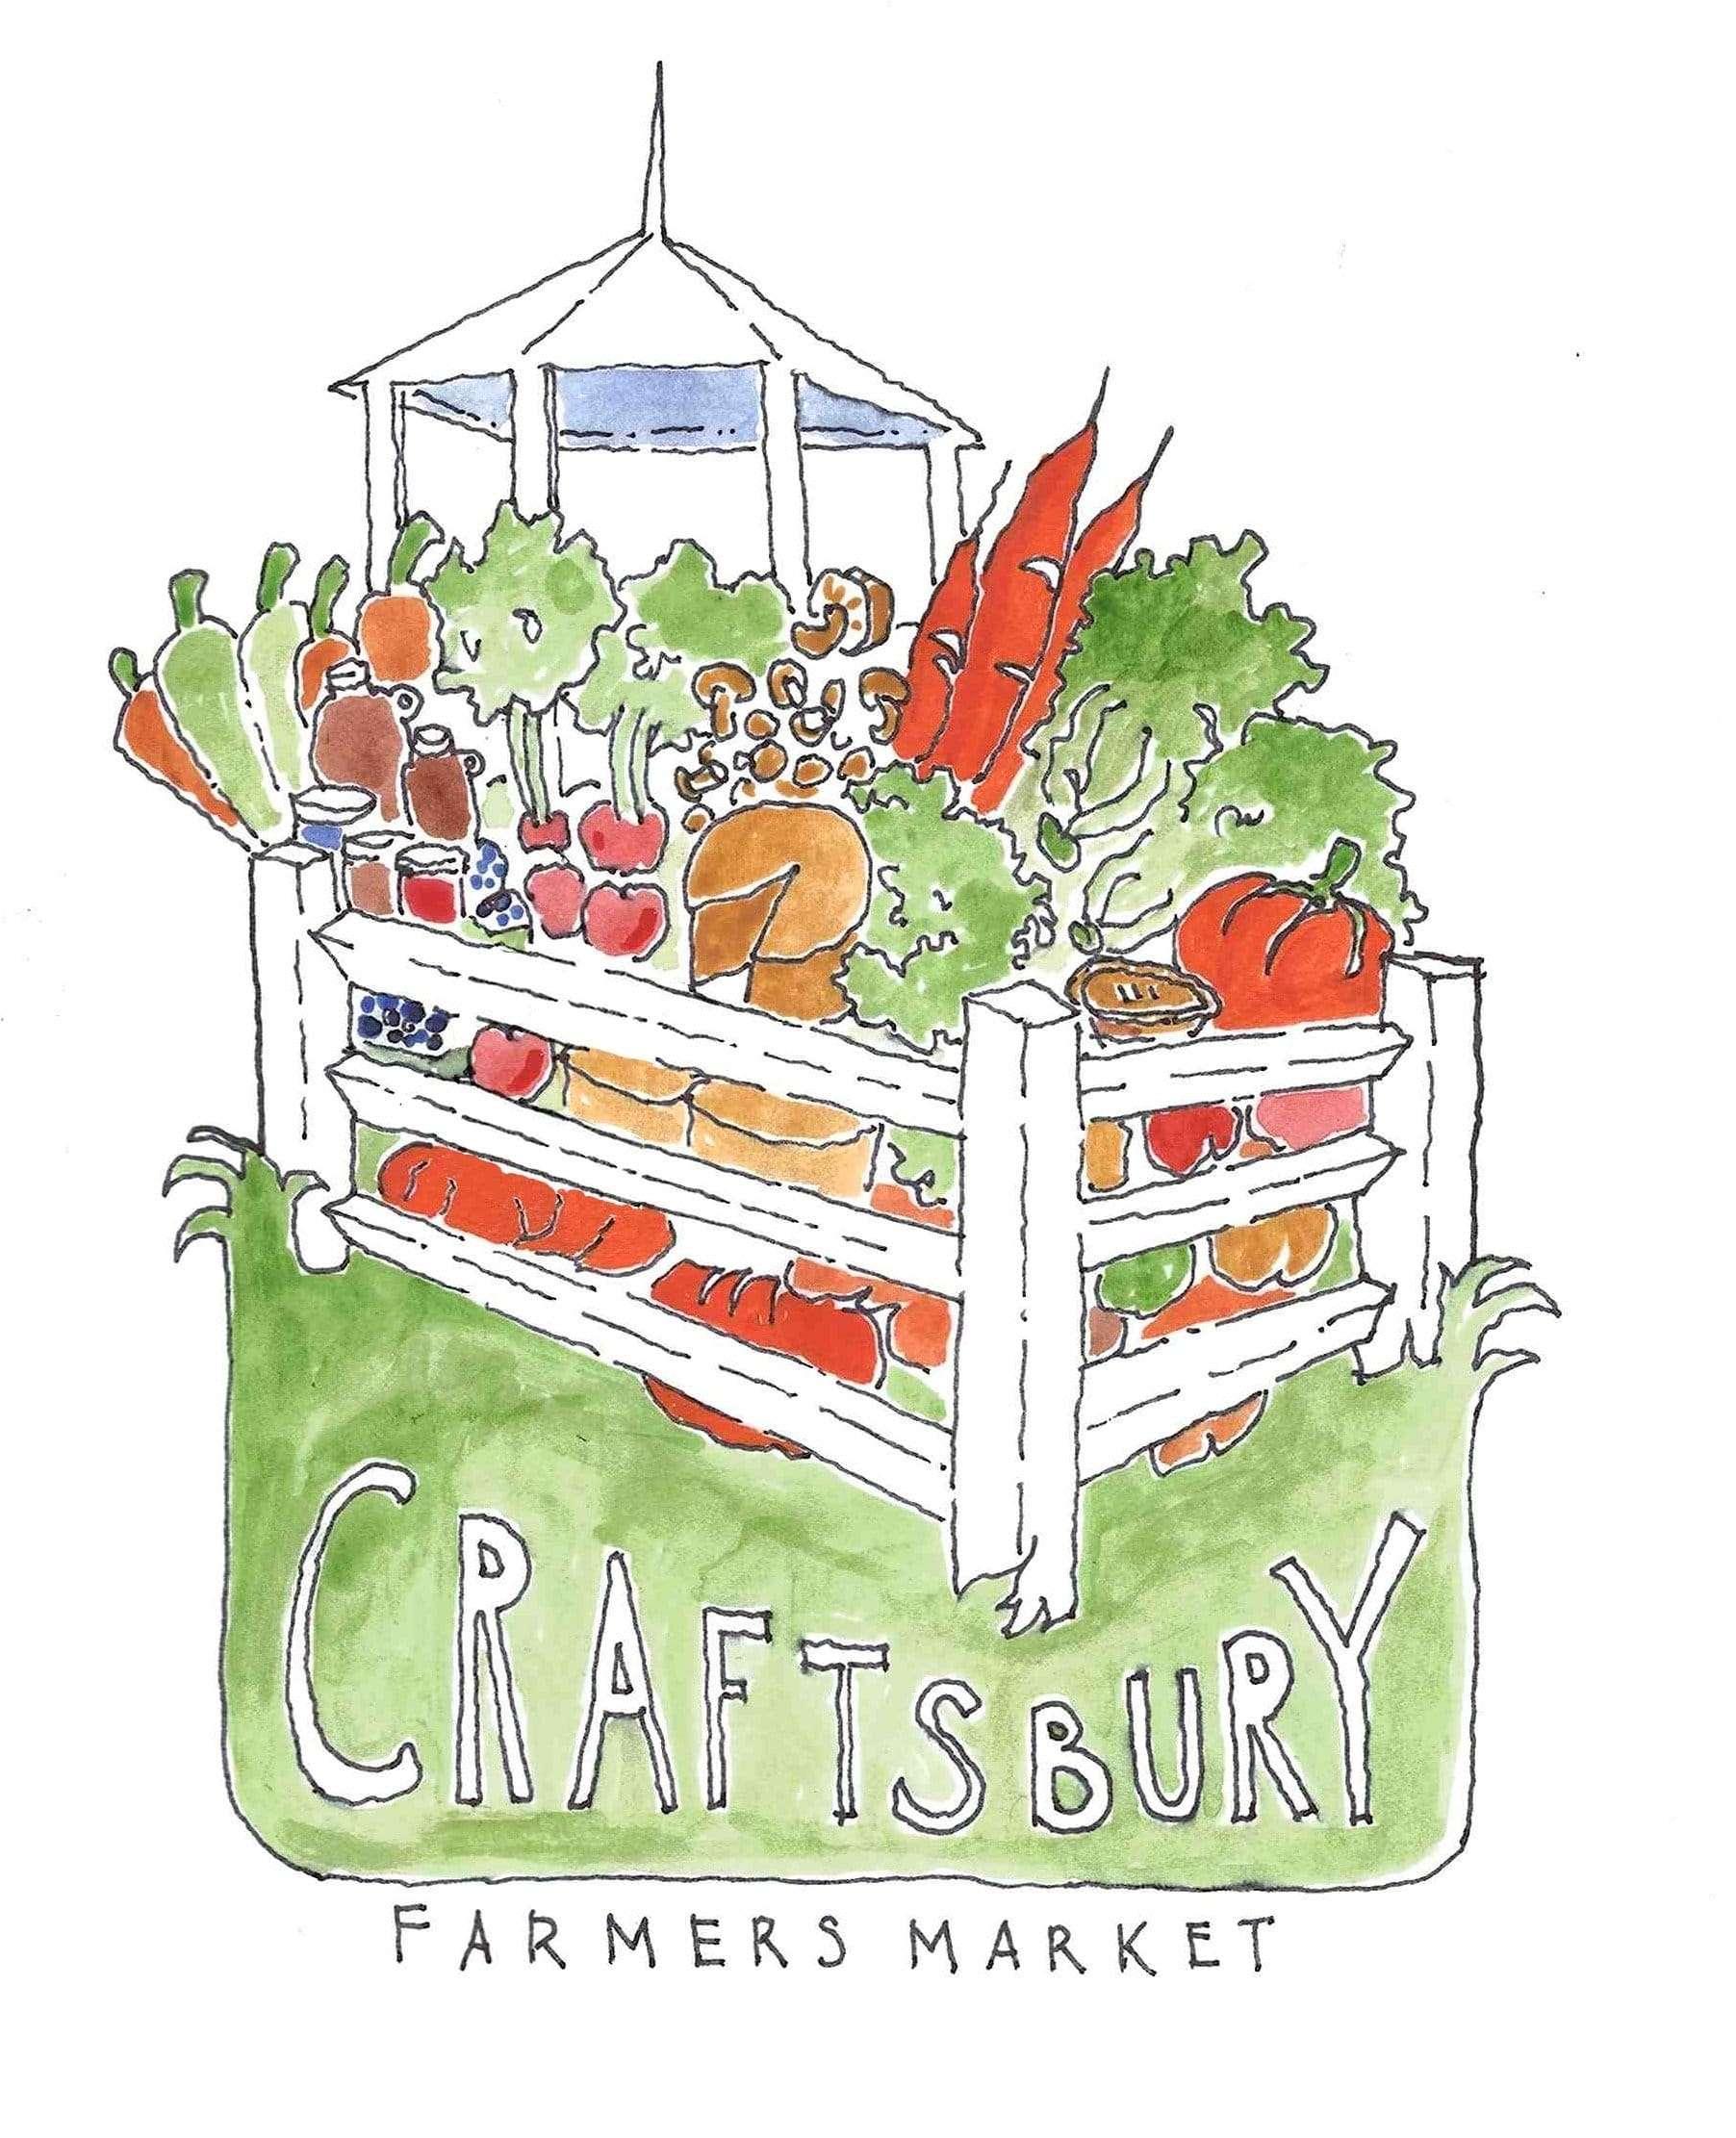 Craftsbury Farmers Market logo competition winner David Koschak